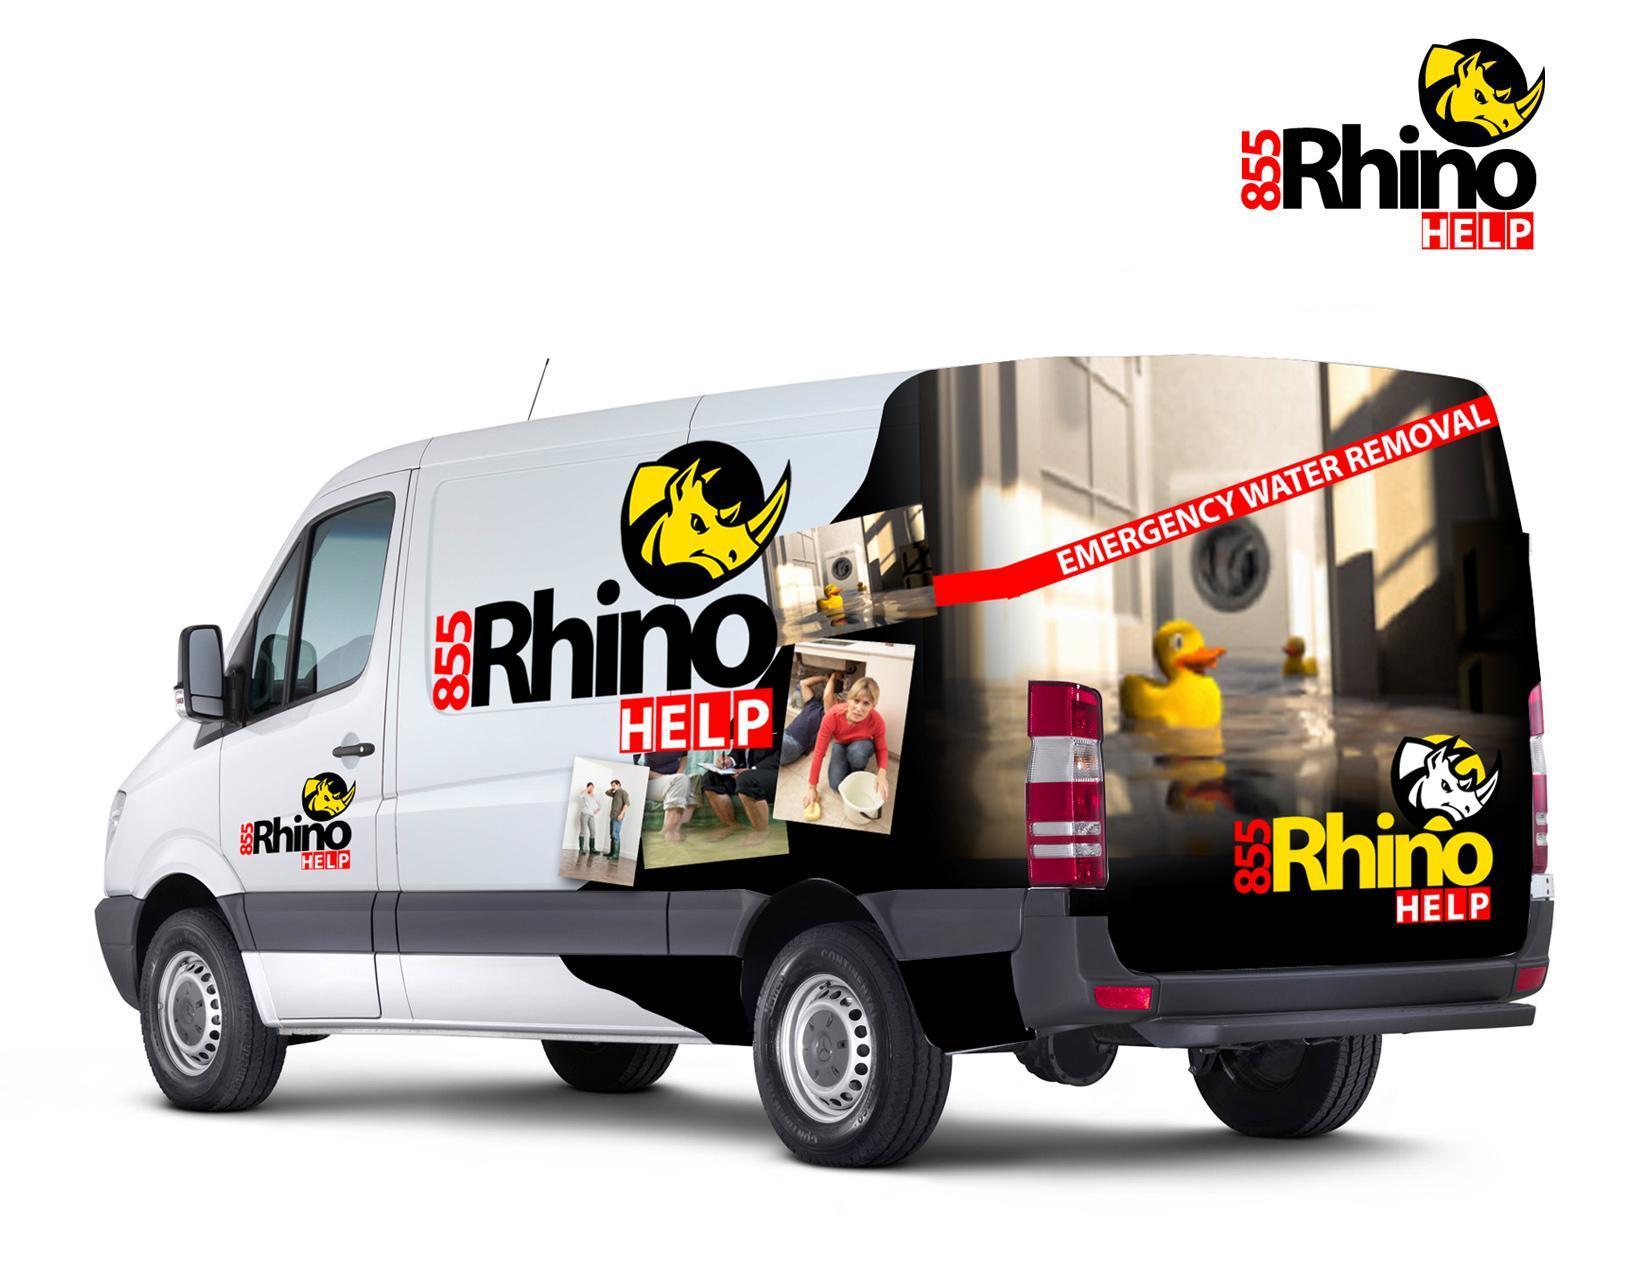 Rhino Emergency Water Removal